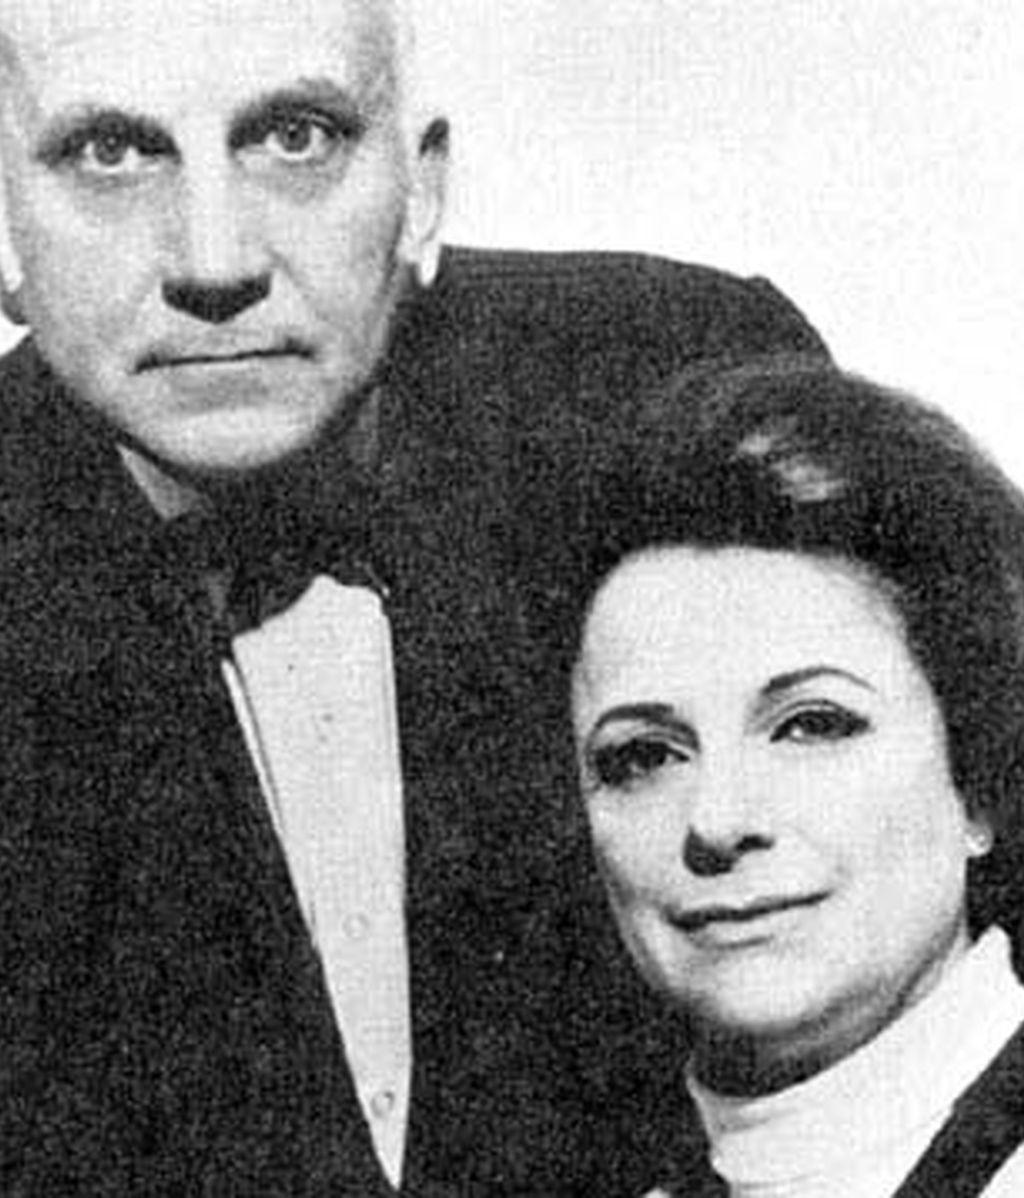 William H. Masters y Virginia E. Johnson, coautores del libro 'The Human Sexual Response'